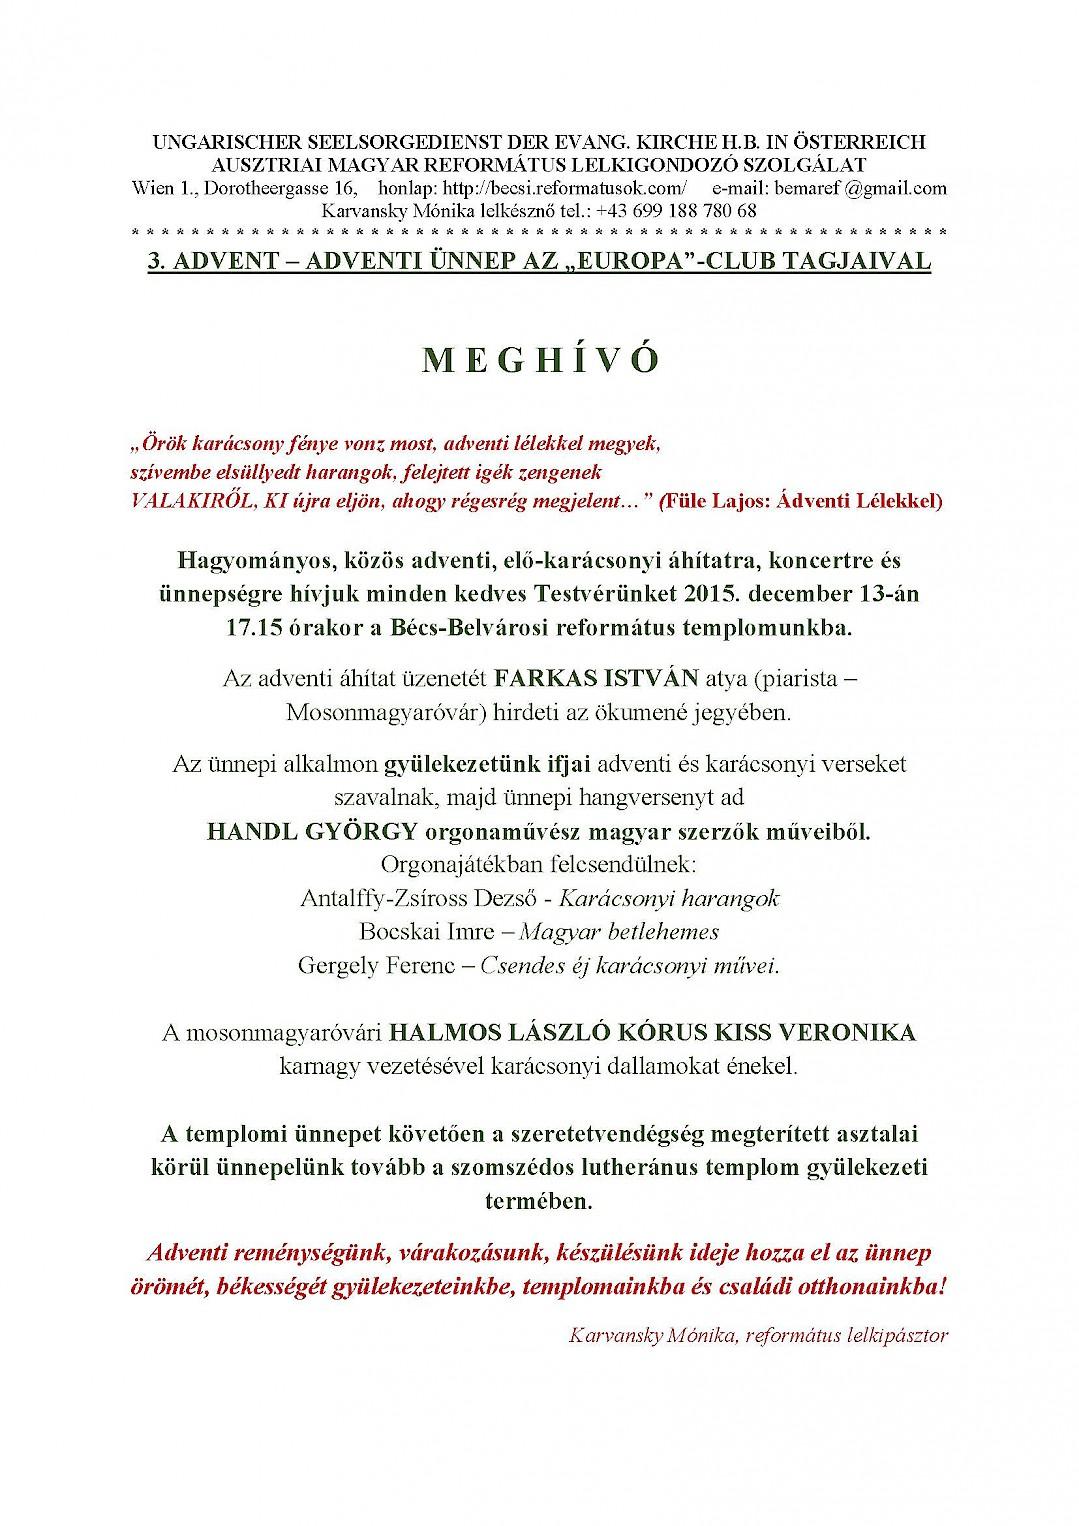 3.ADVENT – ADVENTI ÜNNEP AZ EUROPA-CLUB TAGJAIVAL